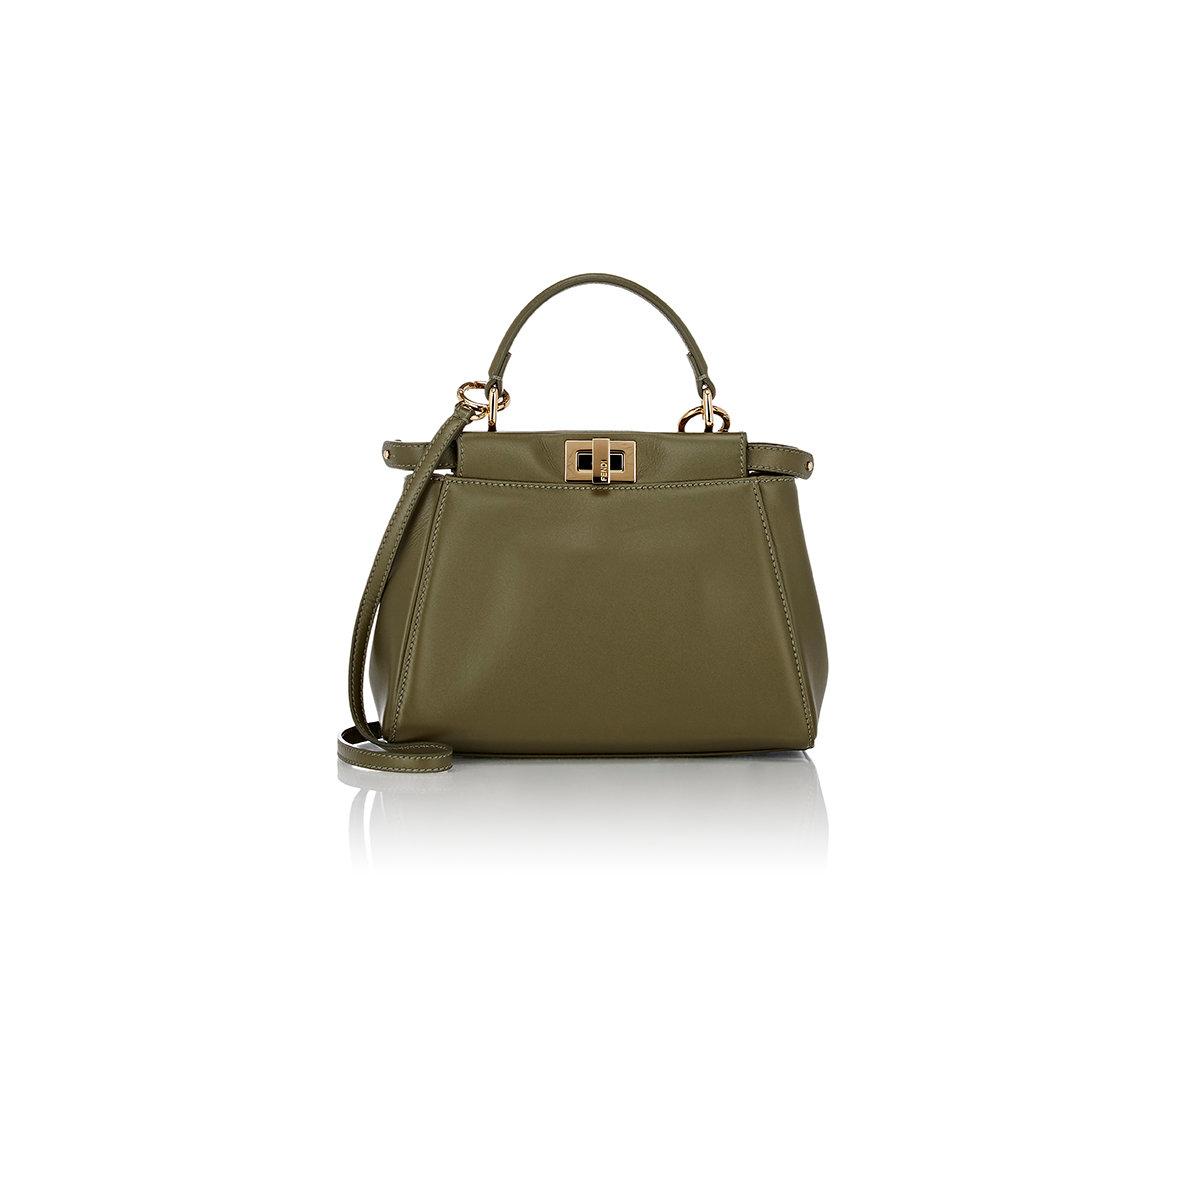 fendi bags outlet online b602  fendi mini peekaboo bag ##randkeyword##